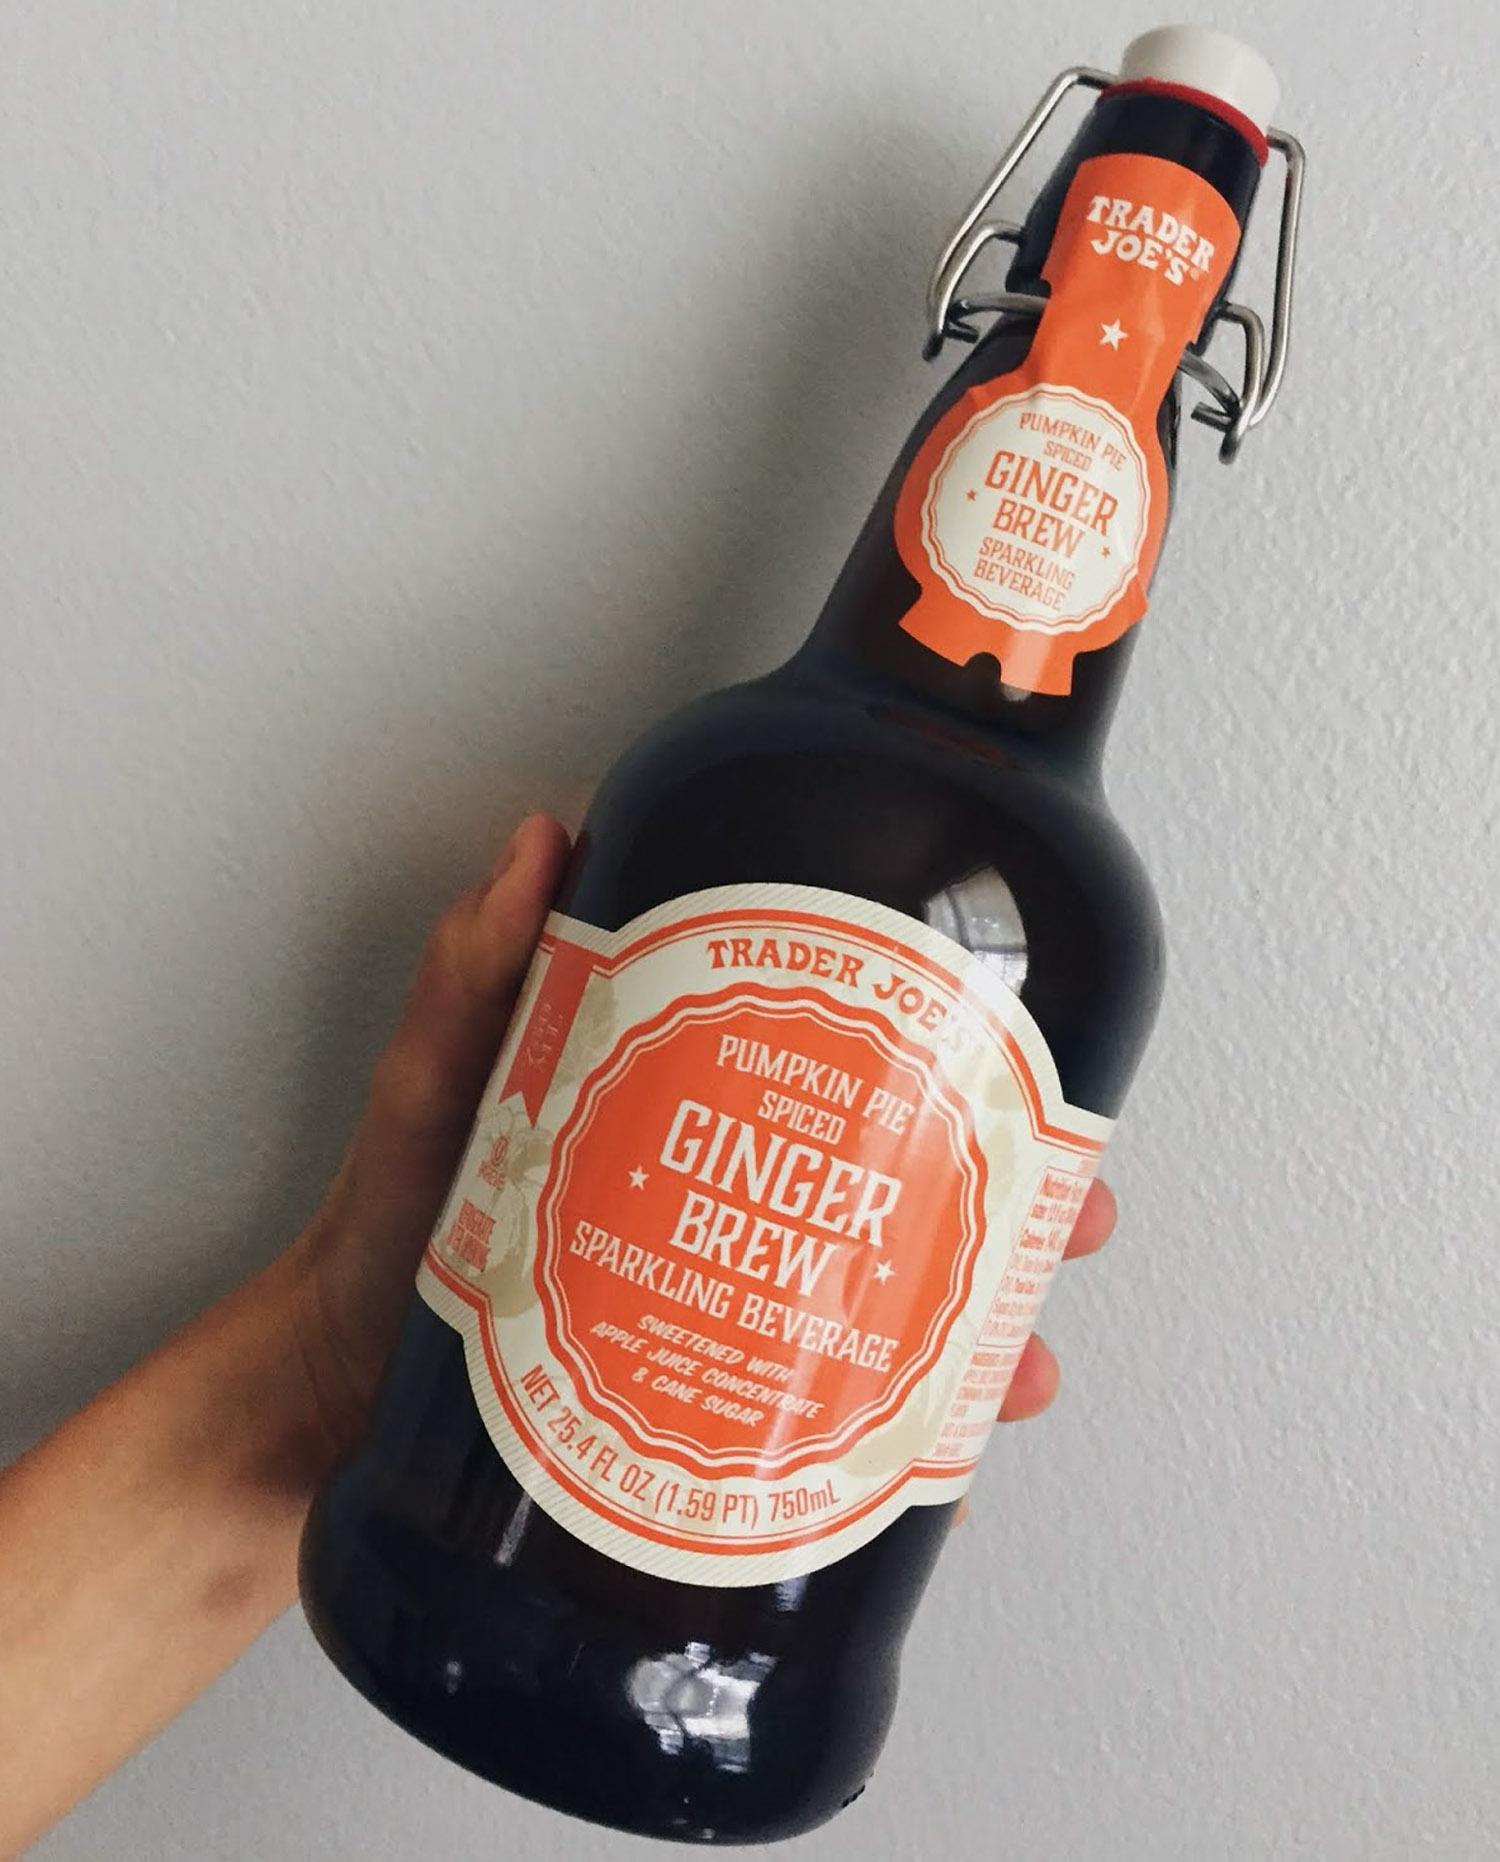 Pumpkin Spiced Ginger Brew